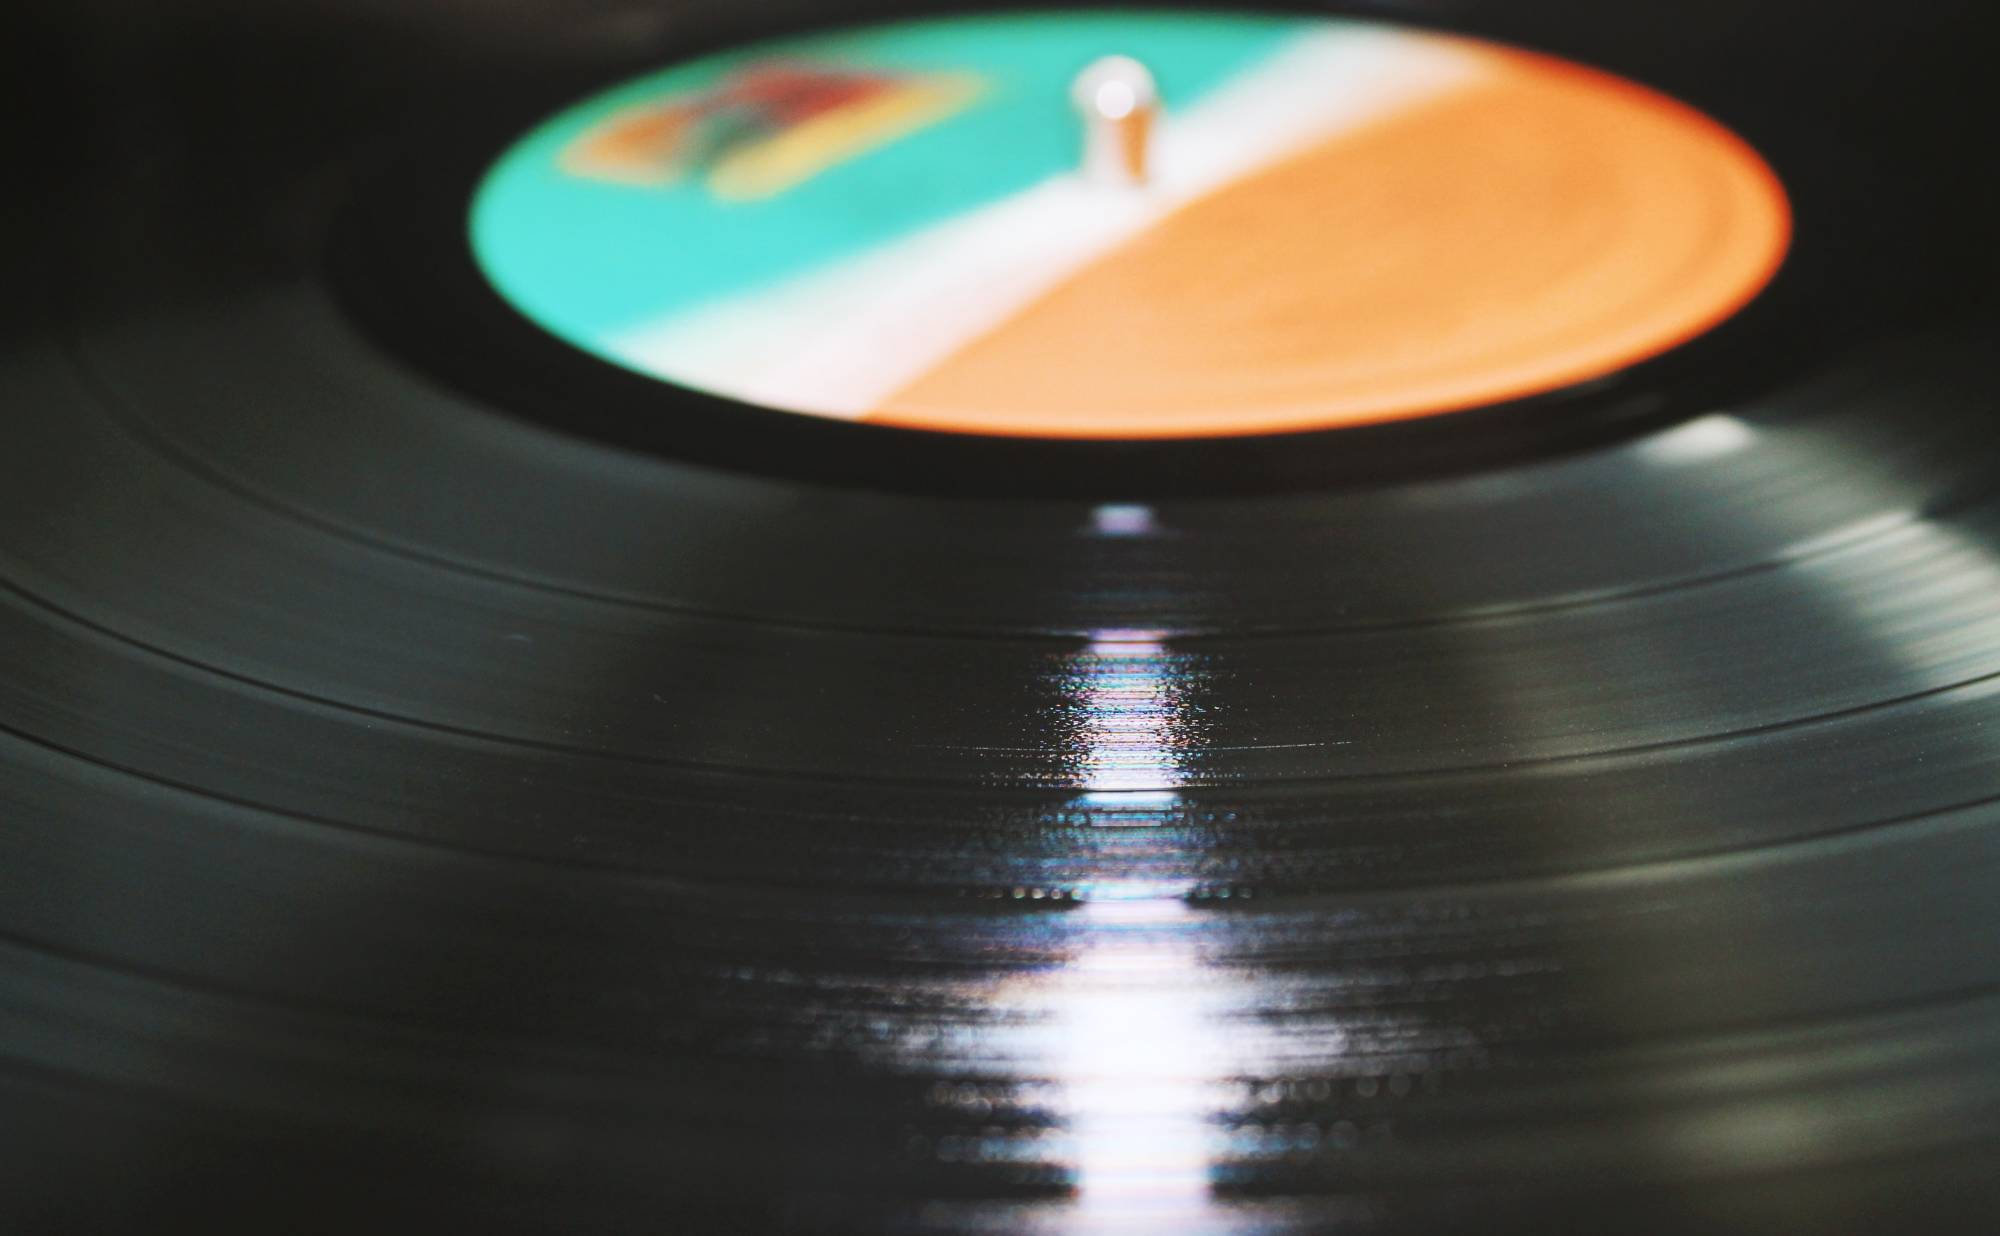 Close up of vinyl record